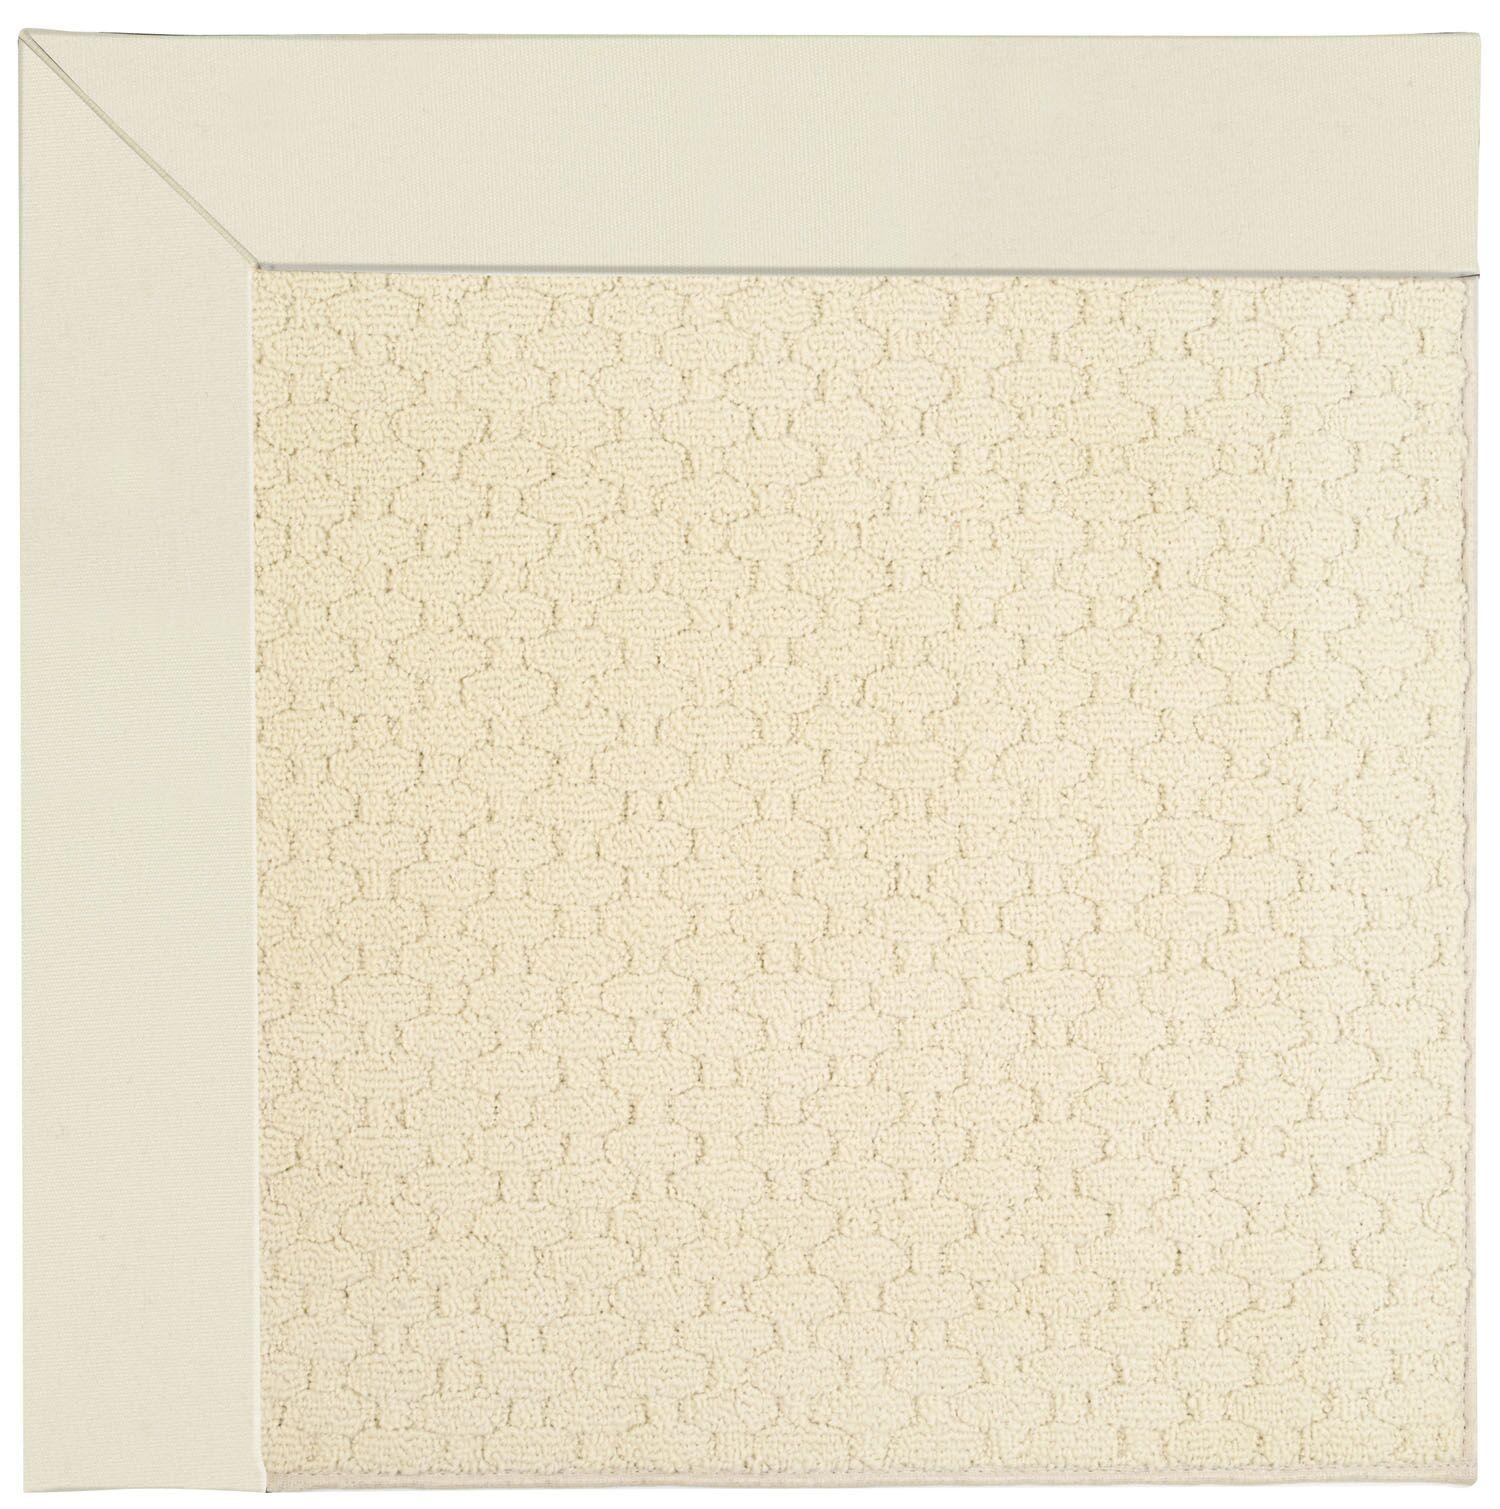 Lisle Alabaster Indoor/Outdoor Area Rug Rug Size: Rectangle 5' x 8'